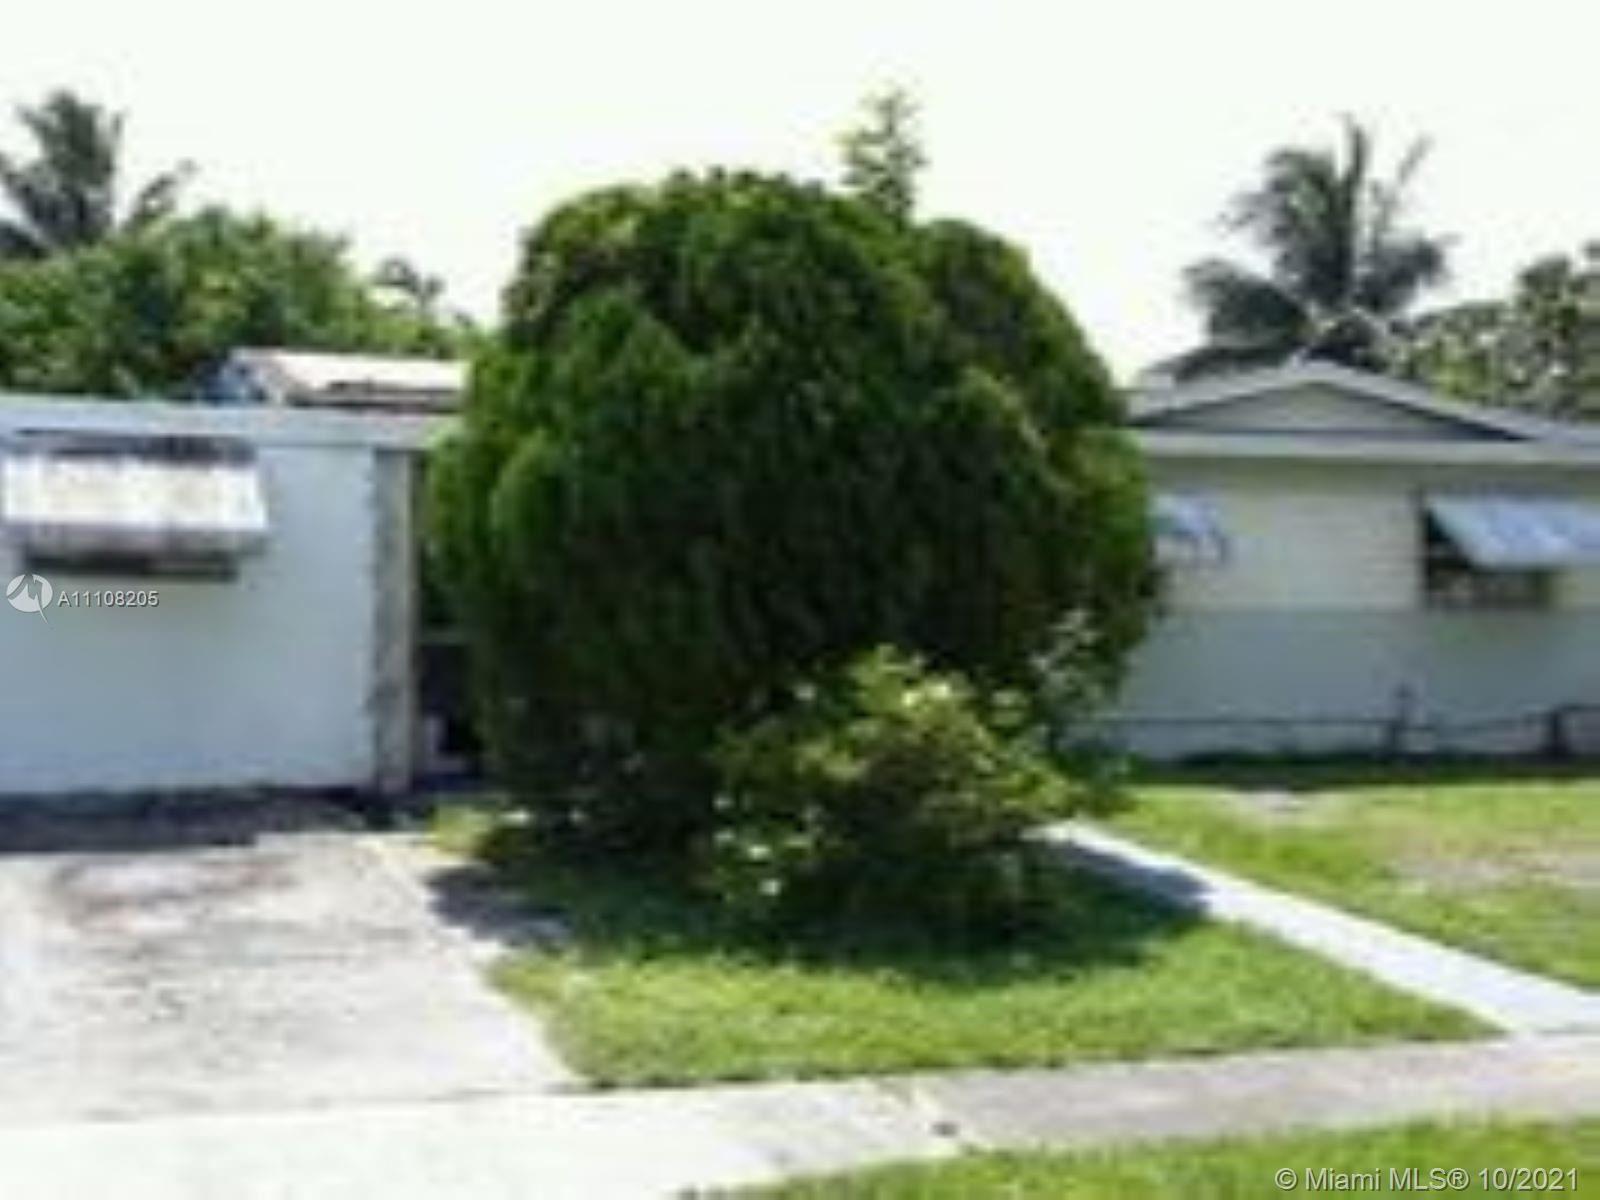 341 SW 67th Ave, Pembroke Pines, FL 33023 - #: A11108205